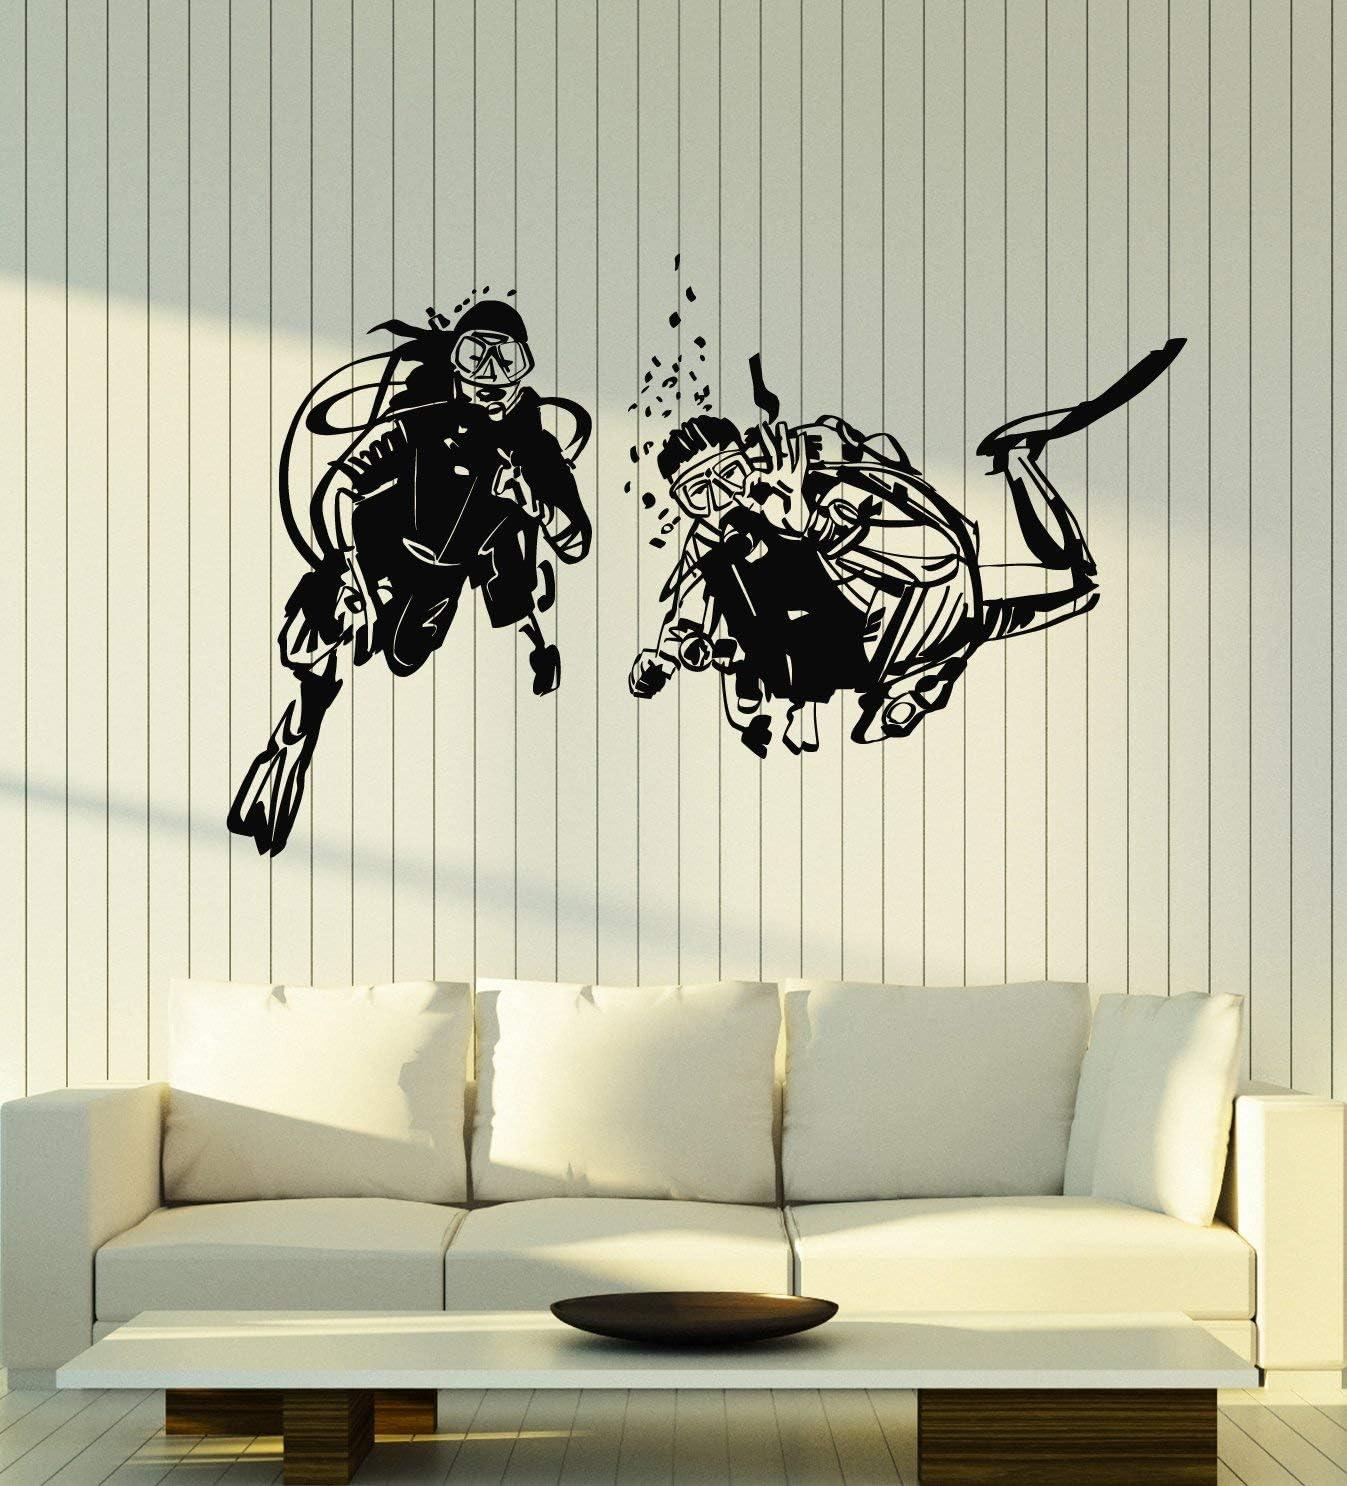 Large Vinyl Wall Decal Divers Ocean Decor Scuba Diving Suit Extreme Sport Stickers Mural (g2514) Black